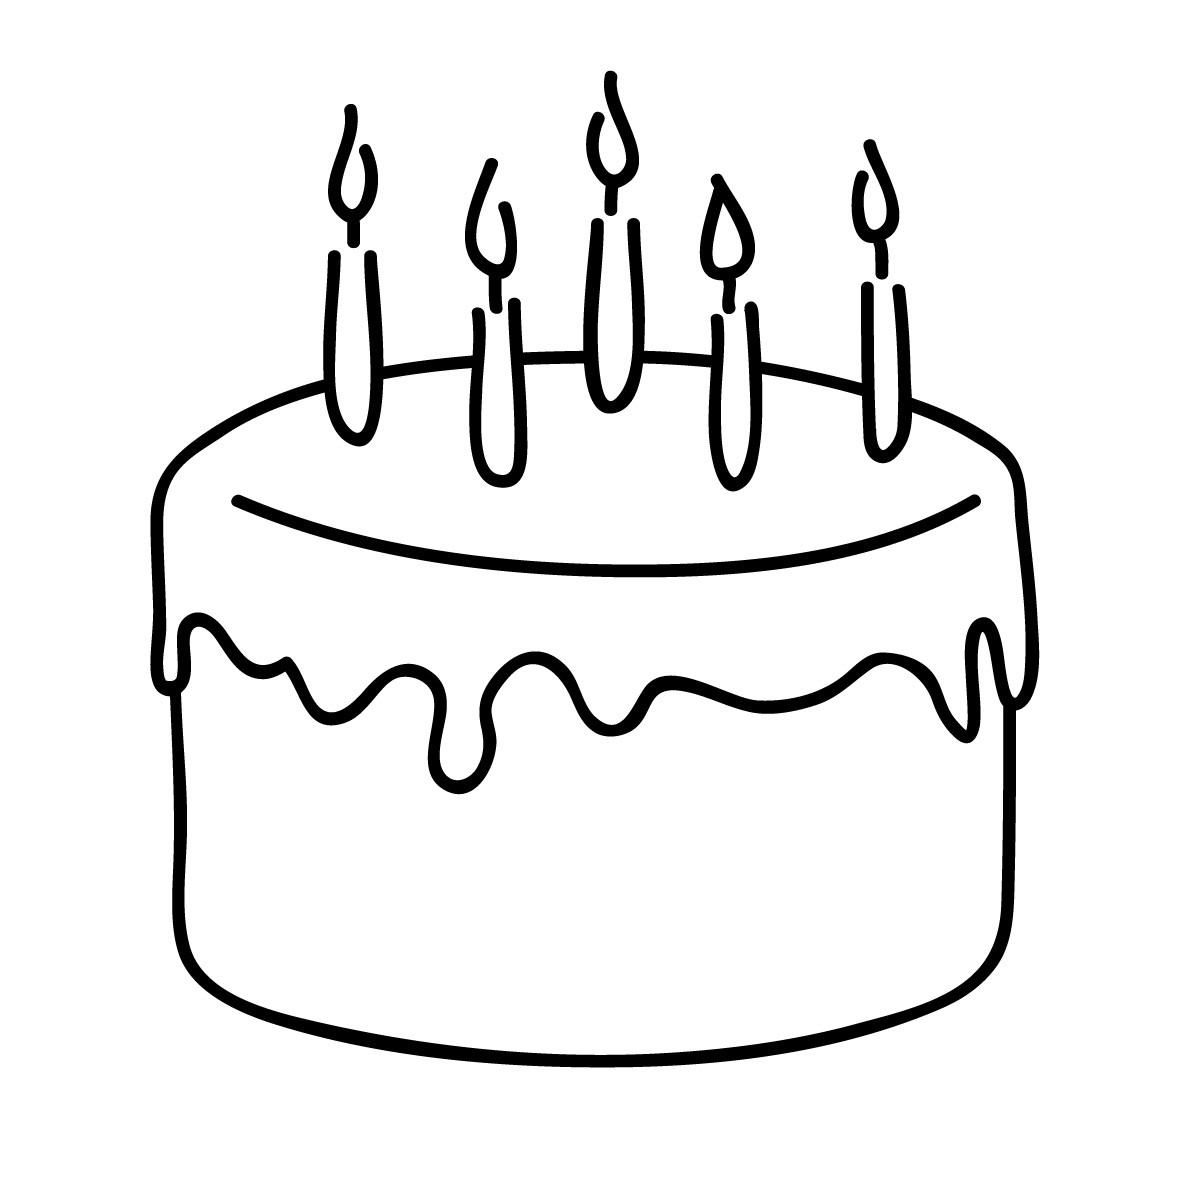 Cake Clipart Black And White  Free Birthday Cake Clip Art